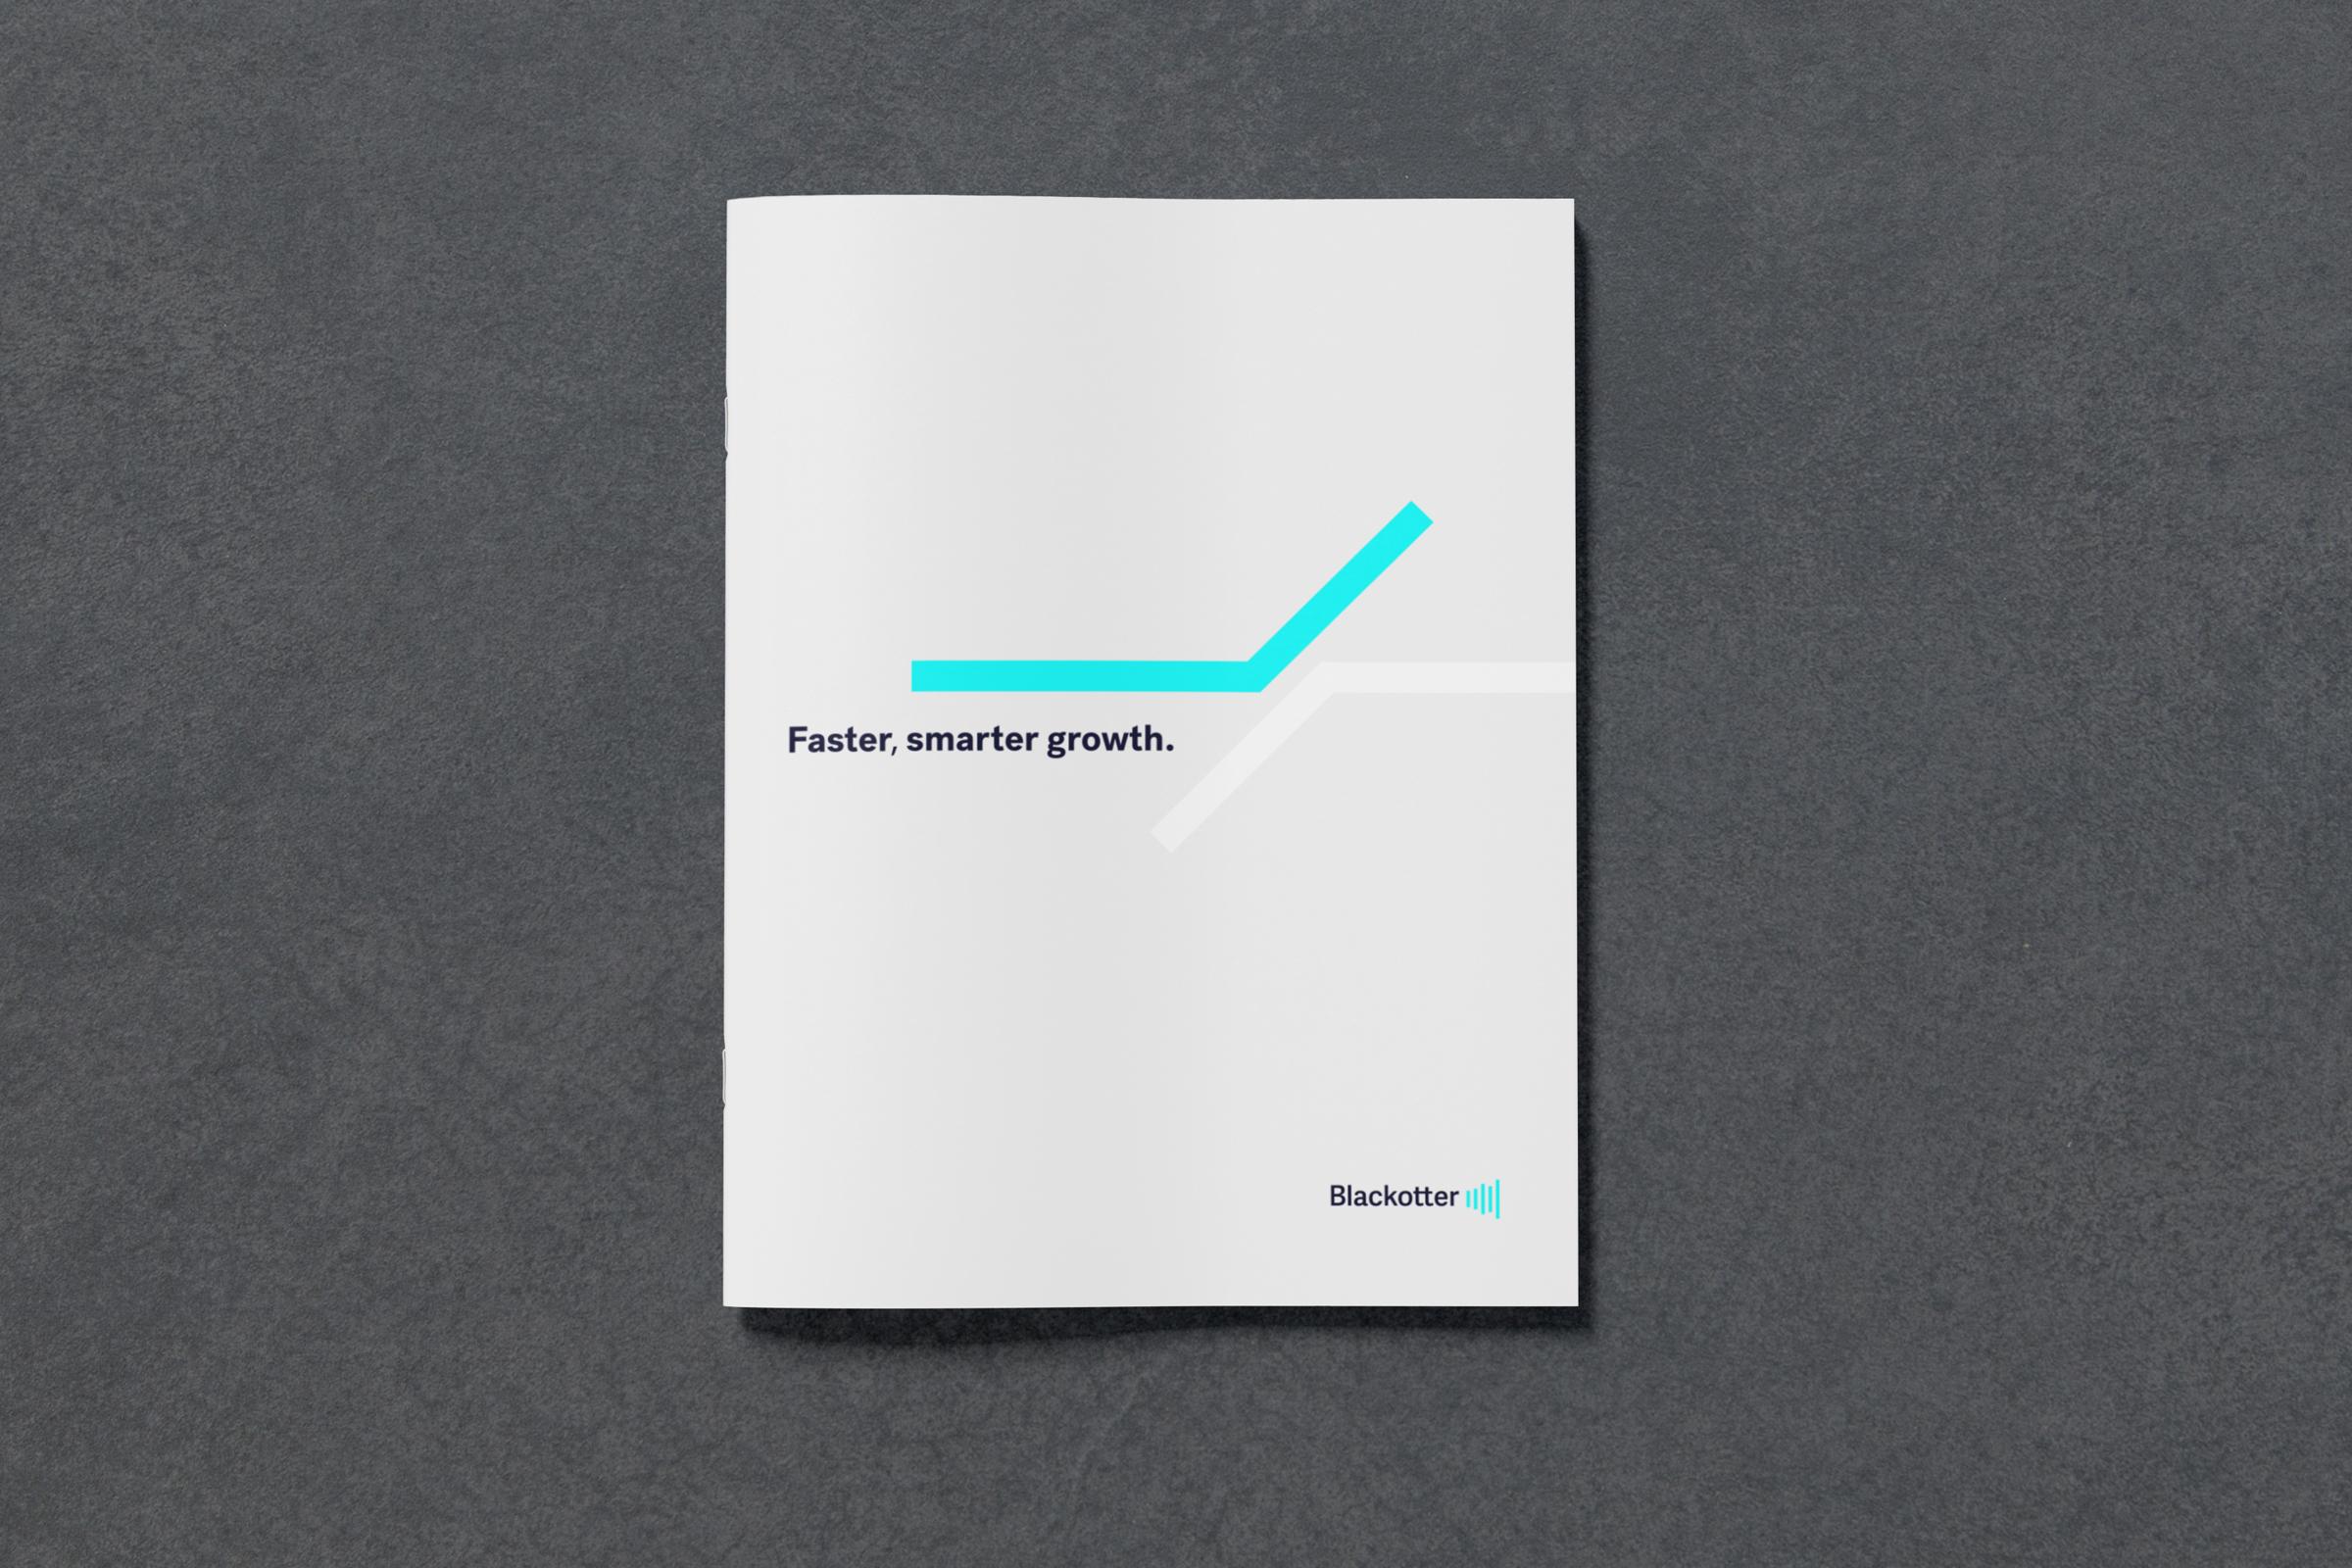 blackotter-branding-logo-designer-perth-proposal